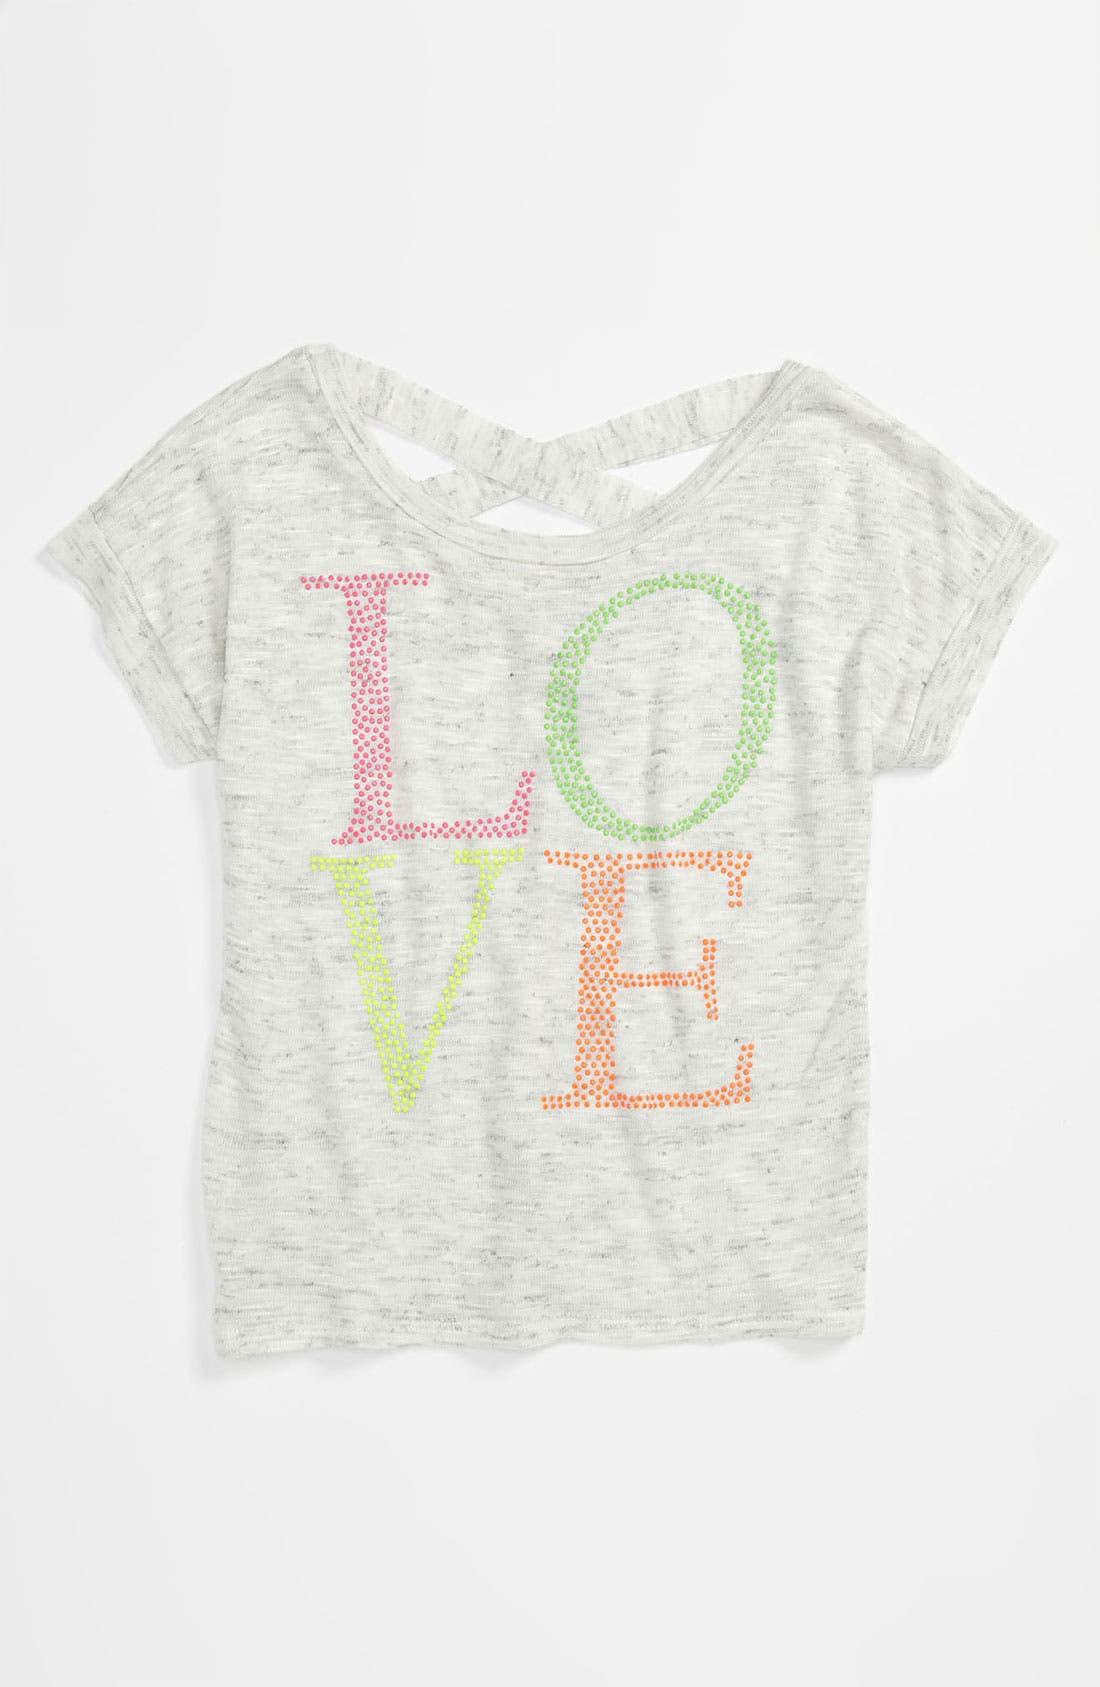 Main Image - Kiddo 'Love' Top (Little Girls)